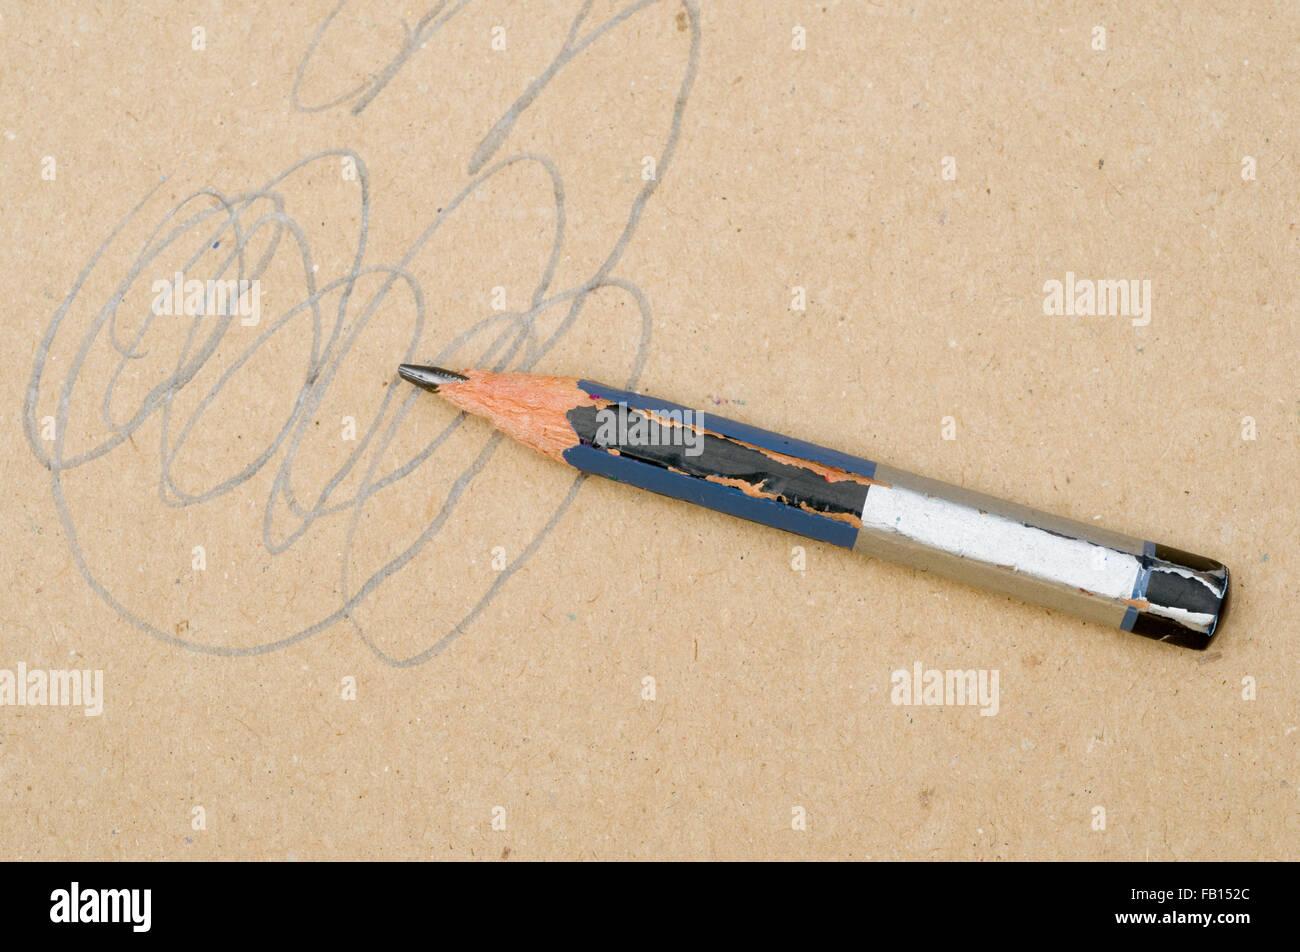 pencil scribble - Stock Image